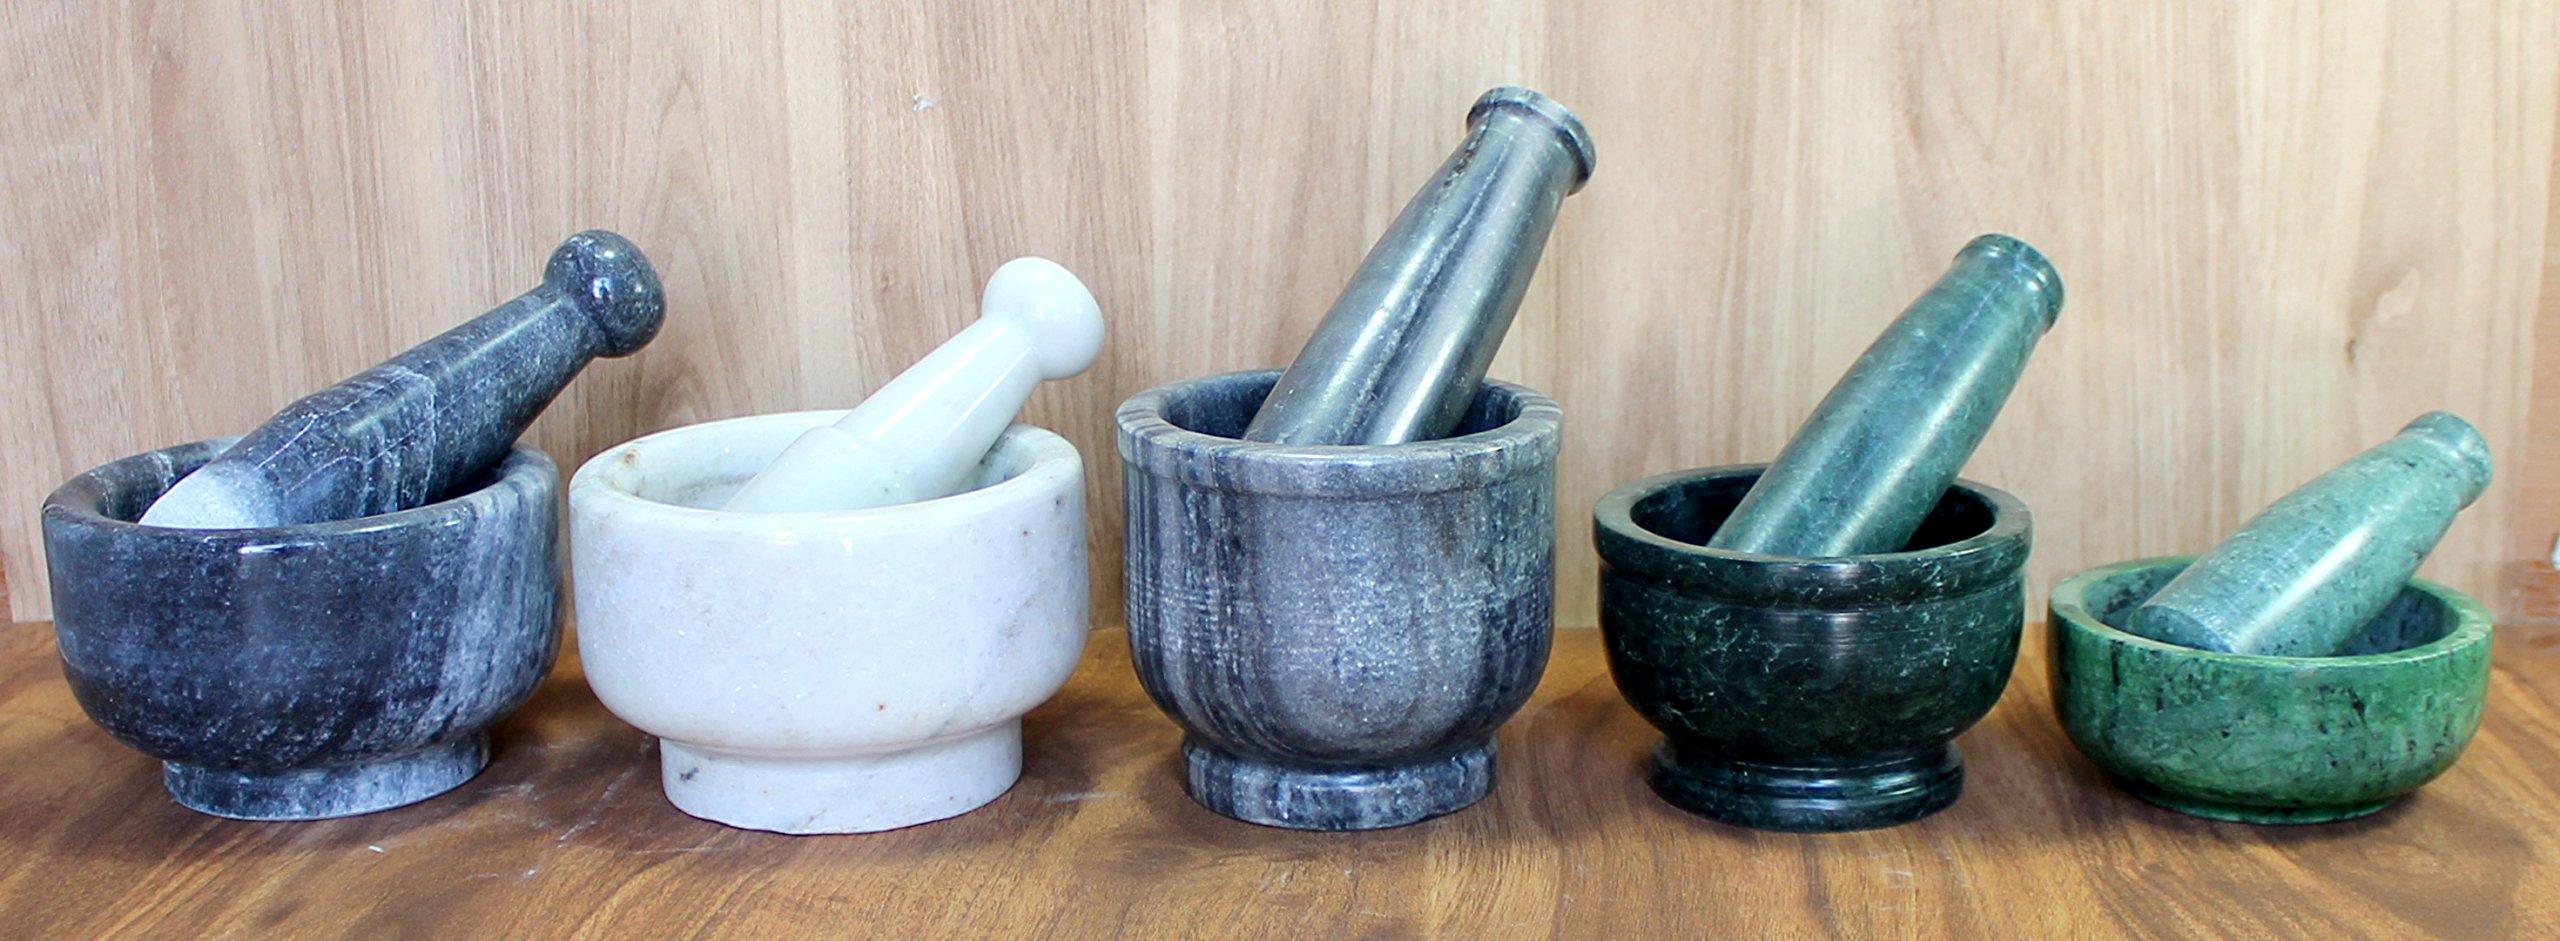 KLEO 5'' Dia White Natural Marble Stone Mortar and Pestle Set as Spice, Medicine Grinder Masher